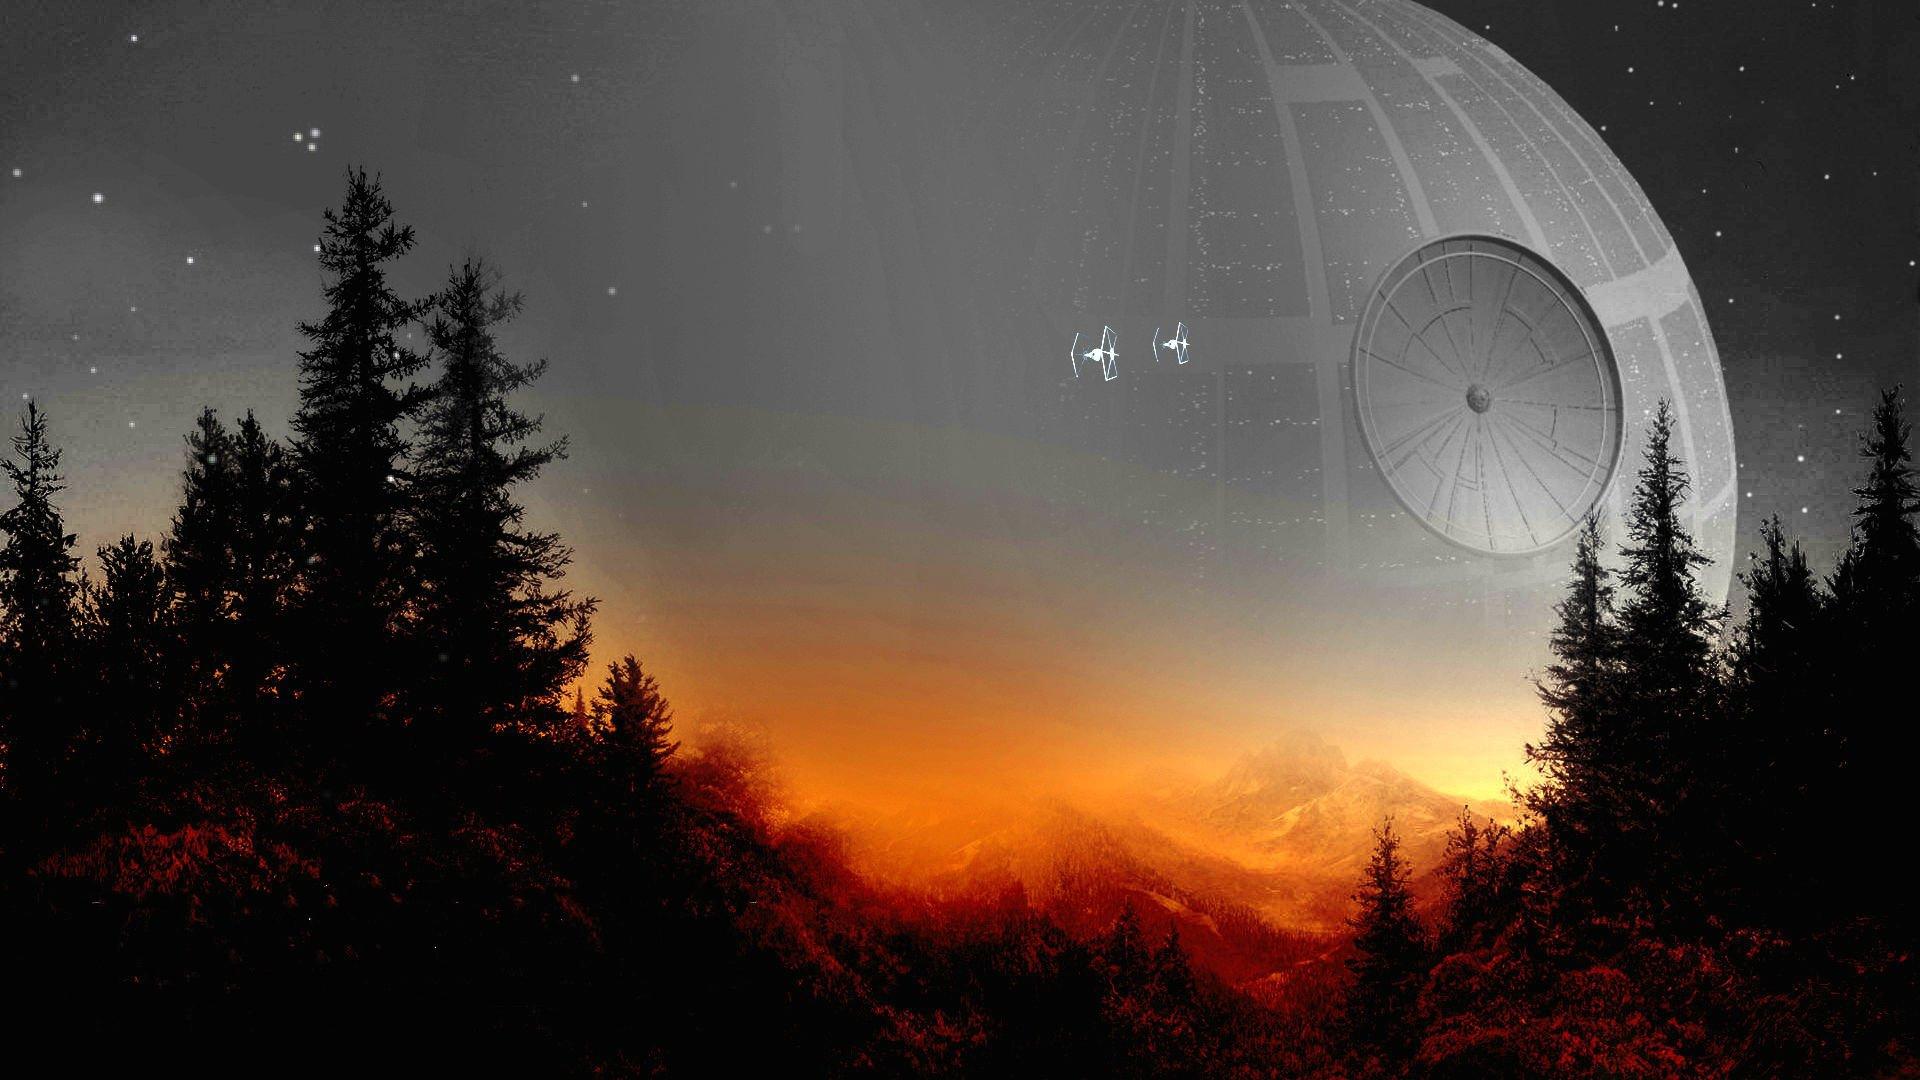 Star Wars Desktop Wallpaper Posted By Michelle Simpson